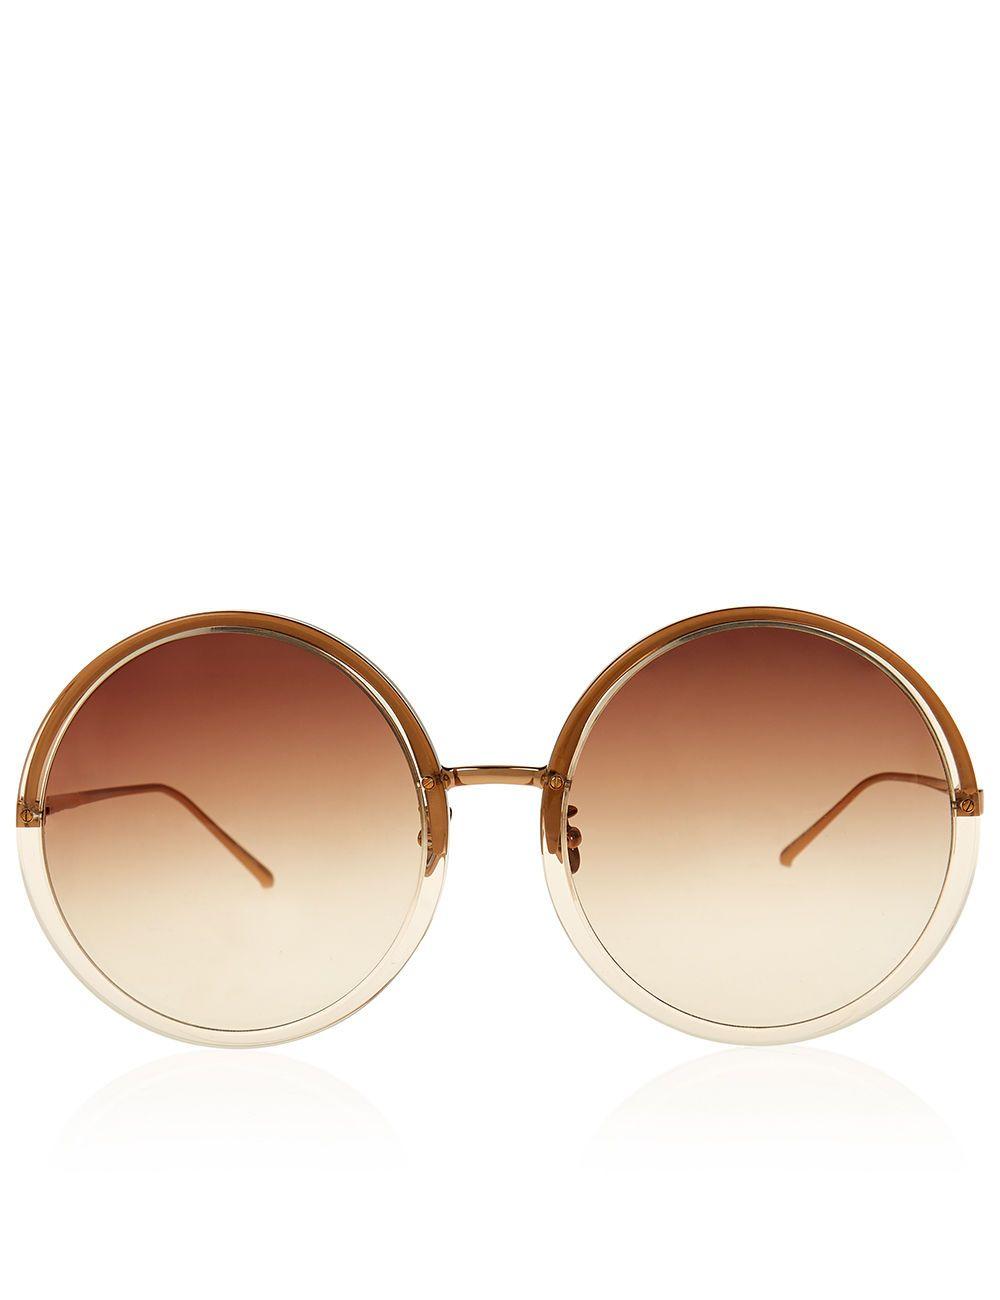 Oversized Round-frame Rose Gold-tone Mirrored Sunglasses - Metallic Linda Farrow 0HL9LwGC